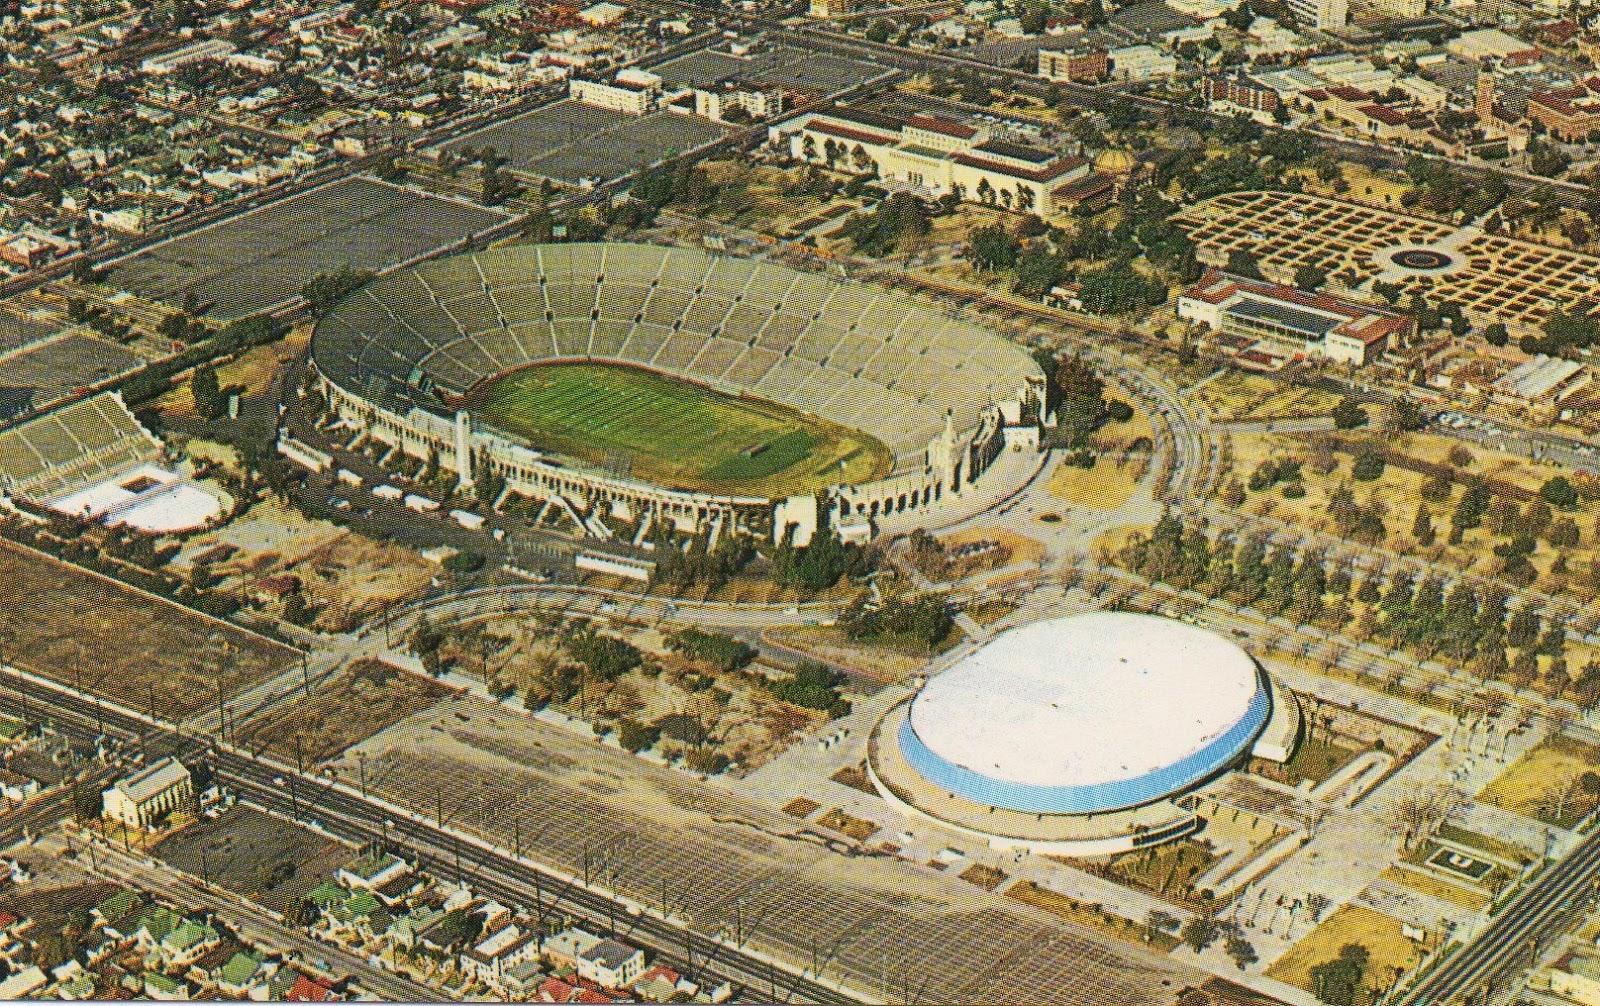 Los Angeles Coliseum & Sports Arena 1950's